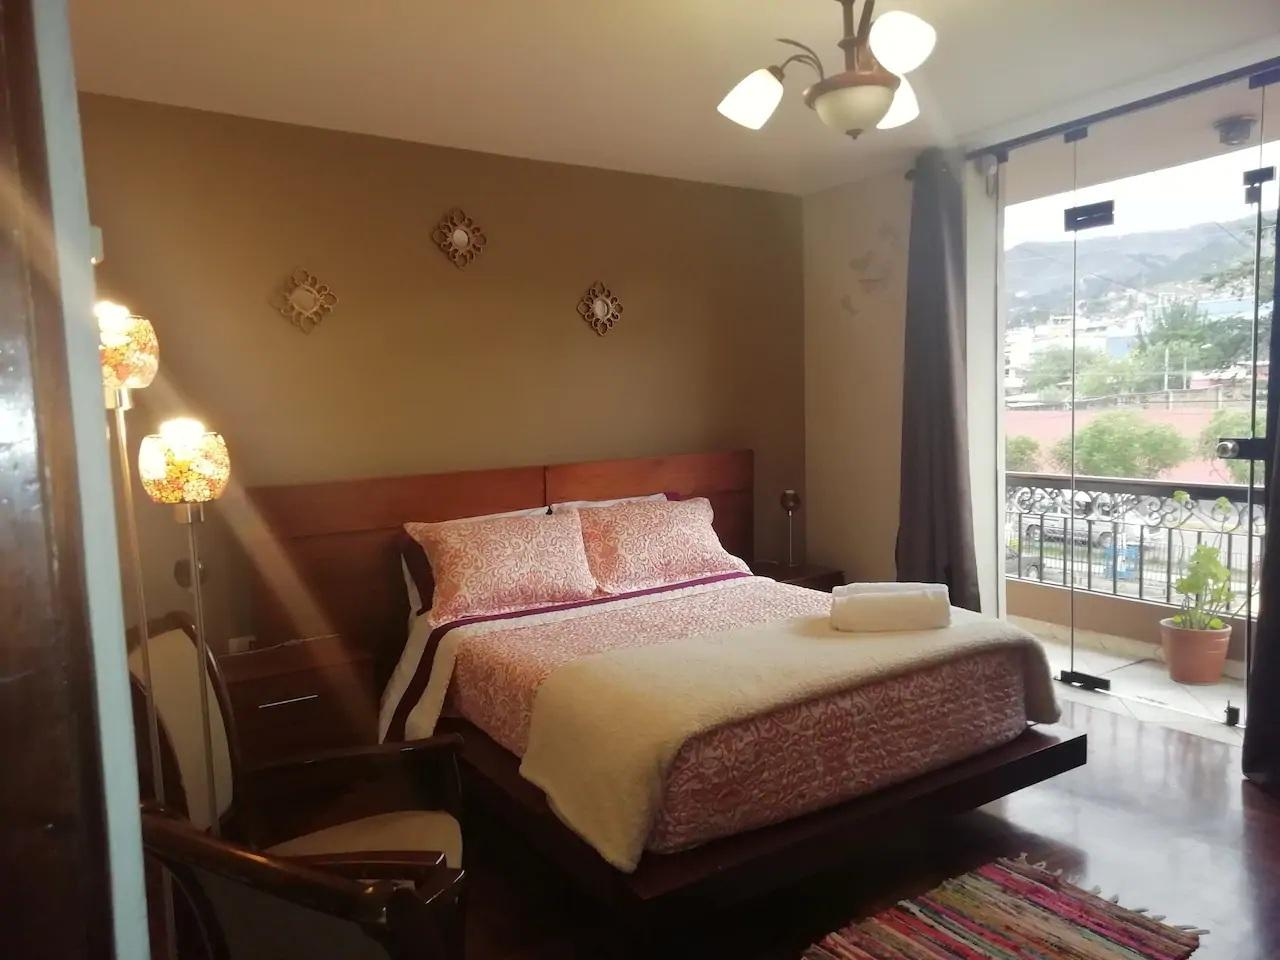 peru - Welcoming Apartment